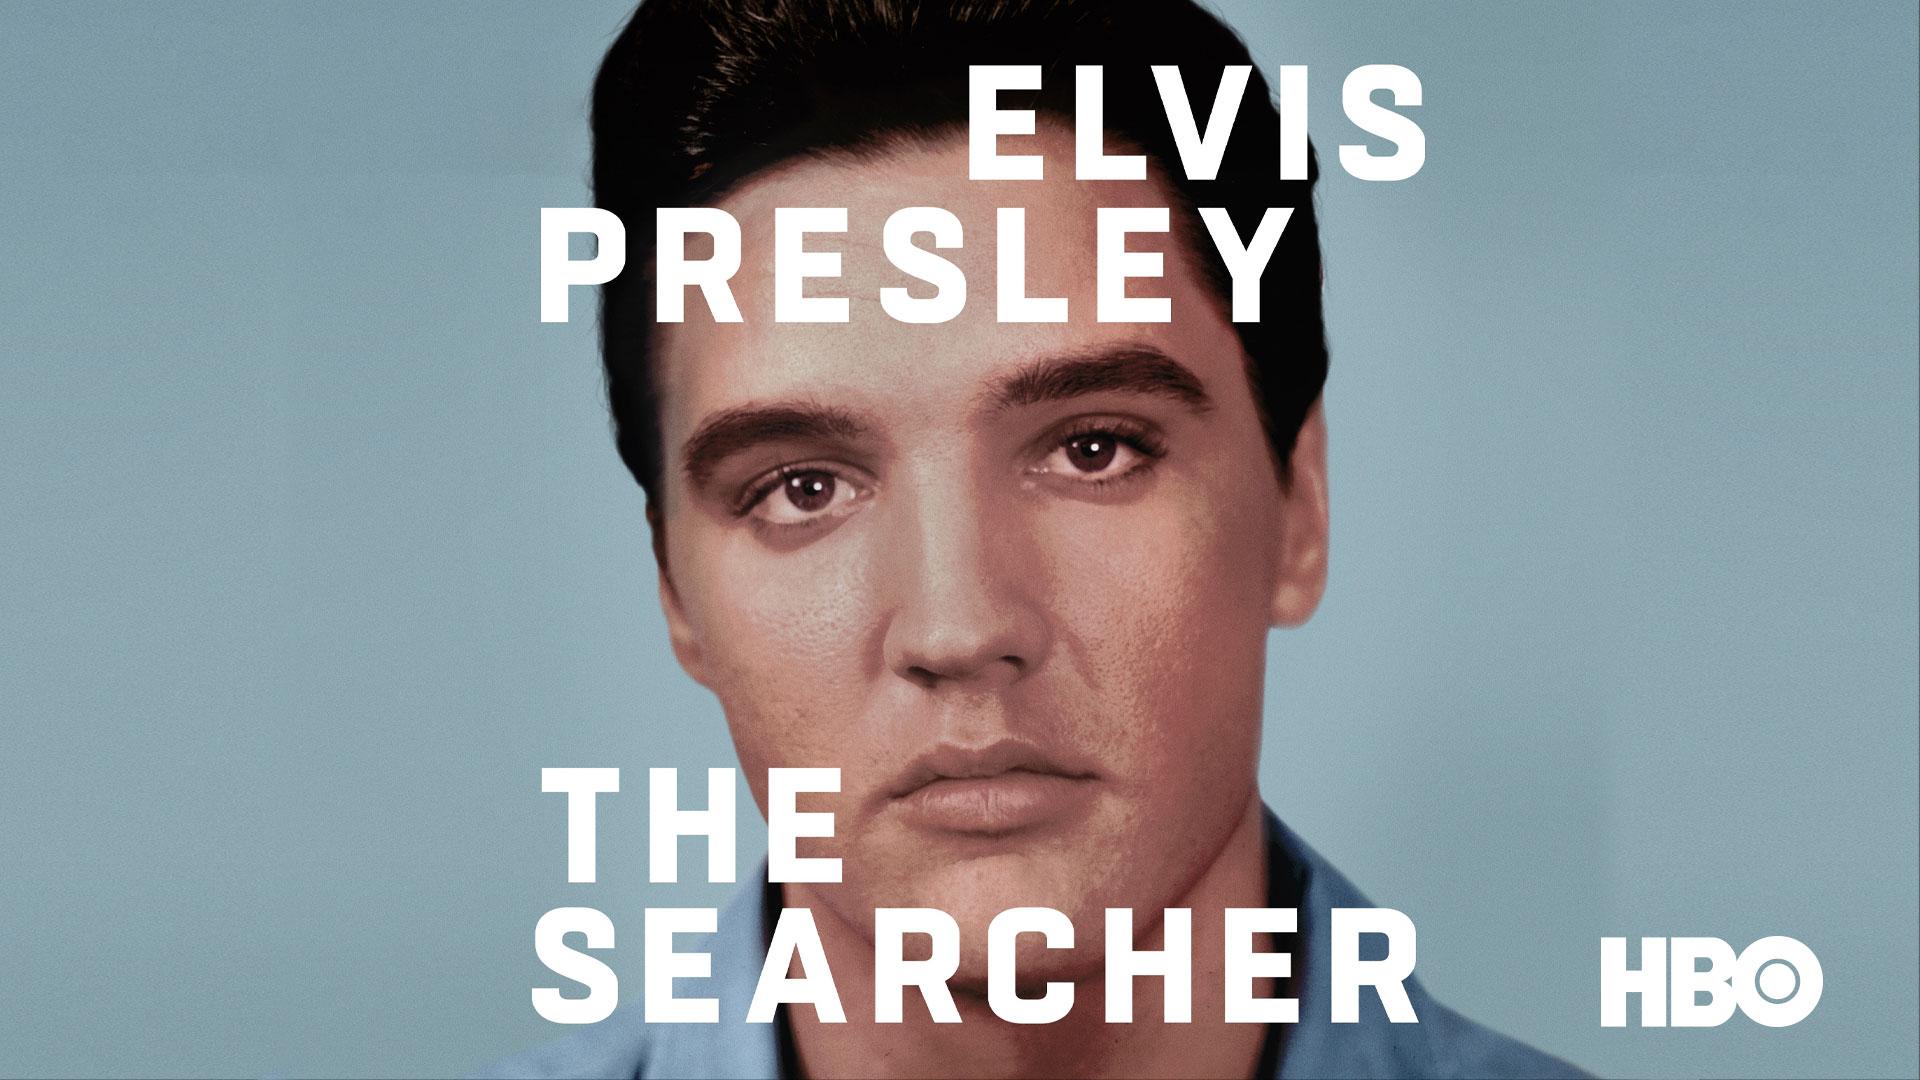 Elvis Presley: The Searcher - Season 1